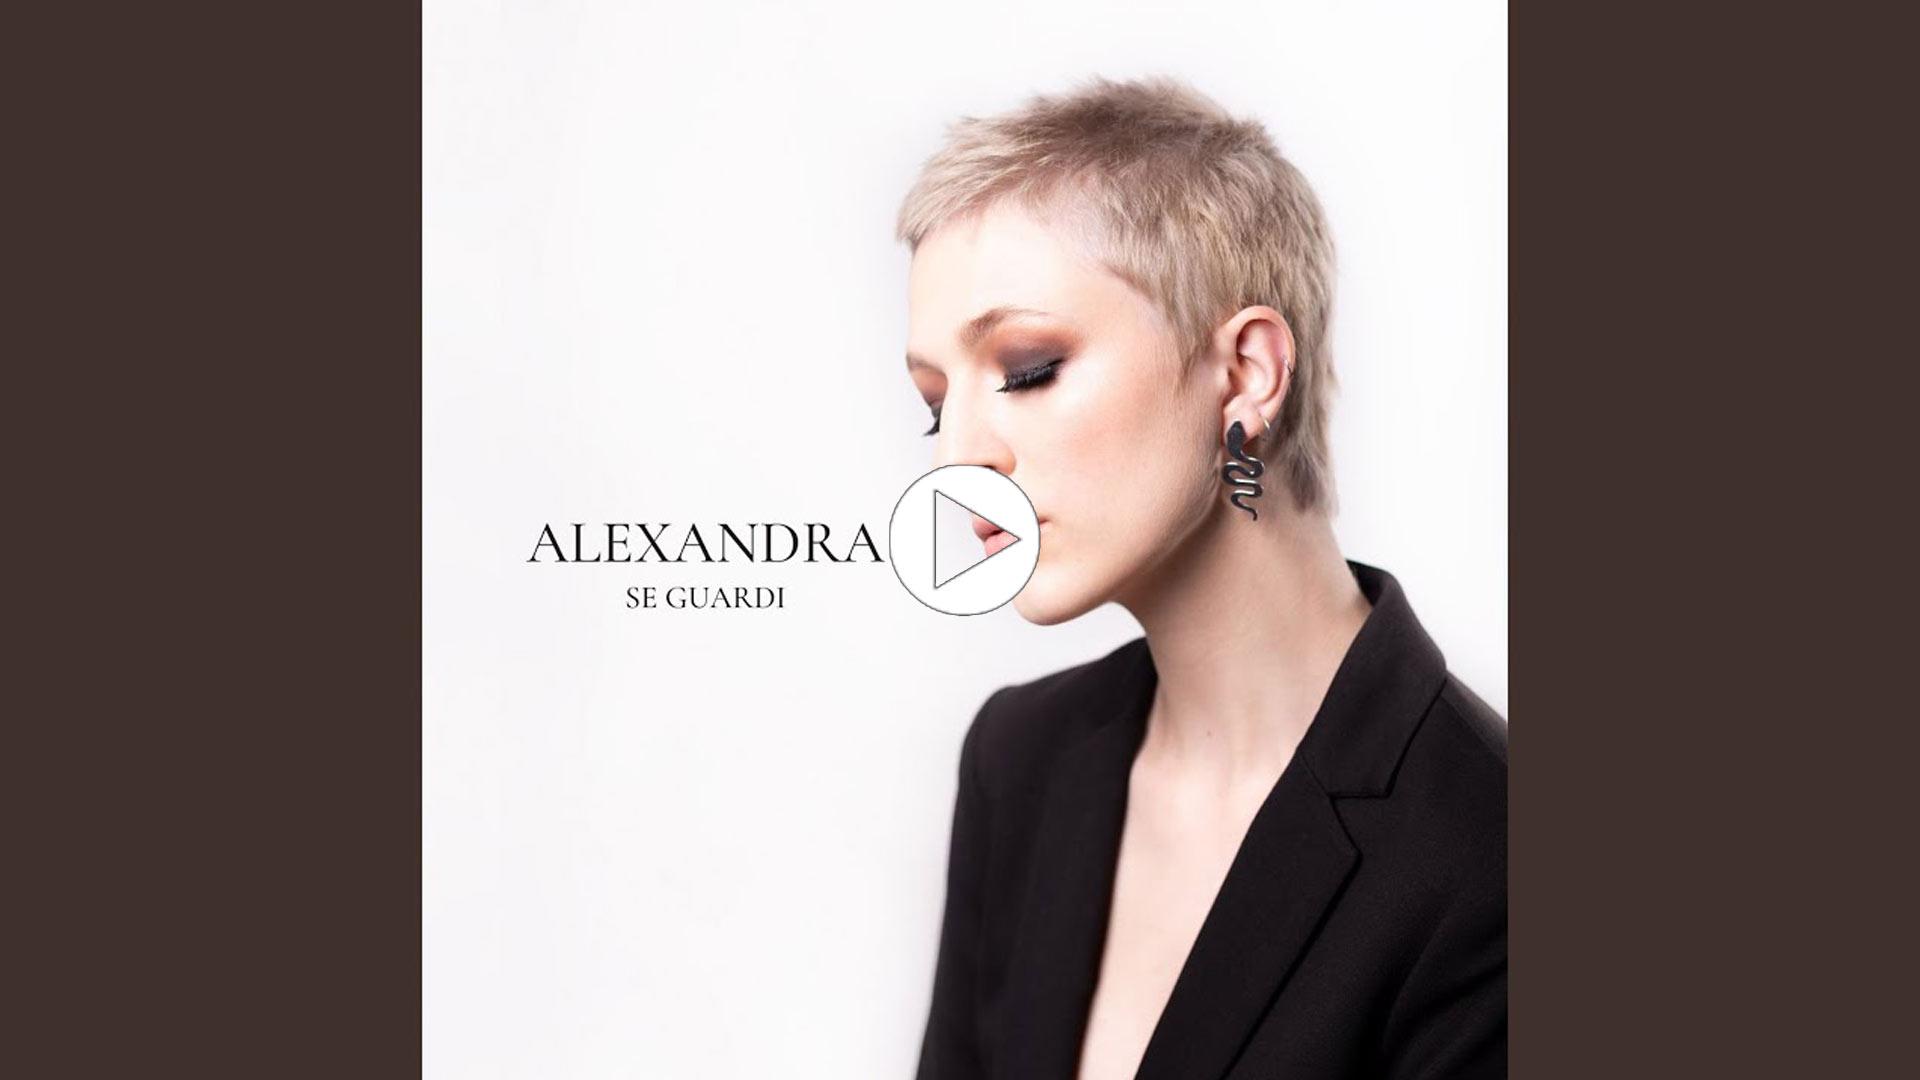 Alexandra - Se guardi